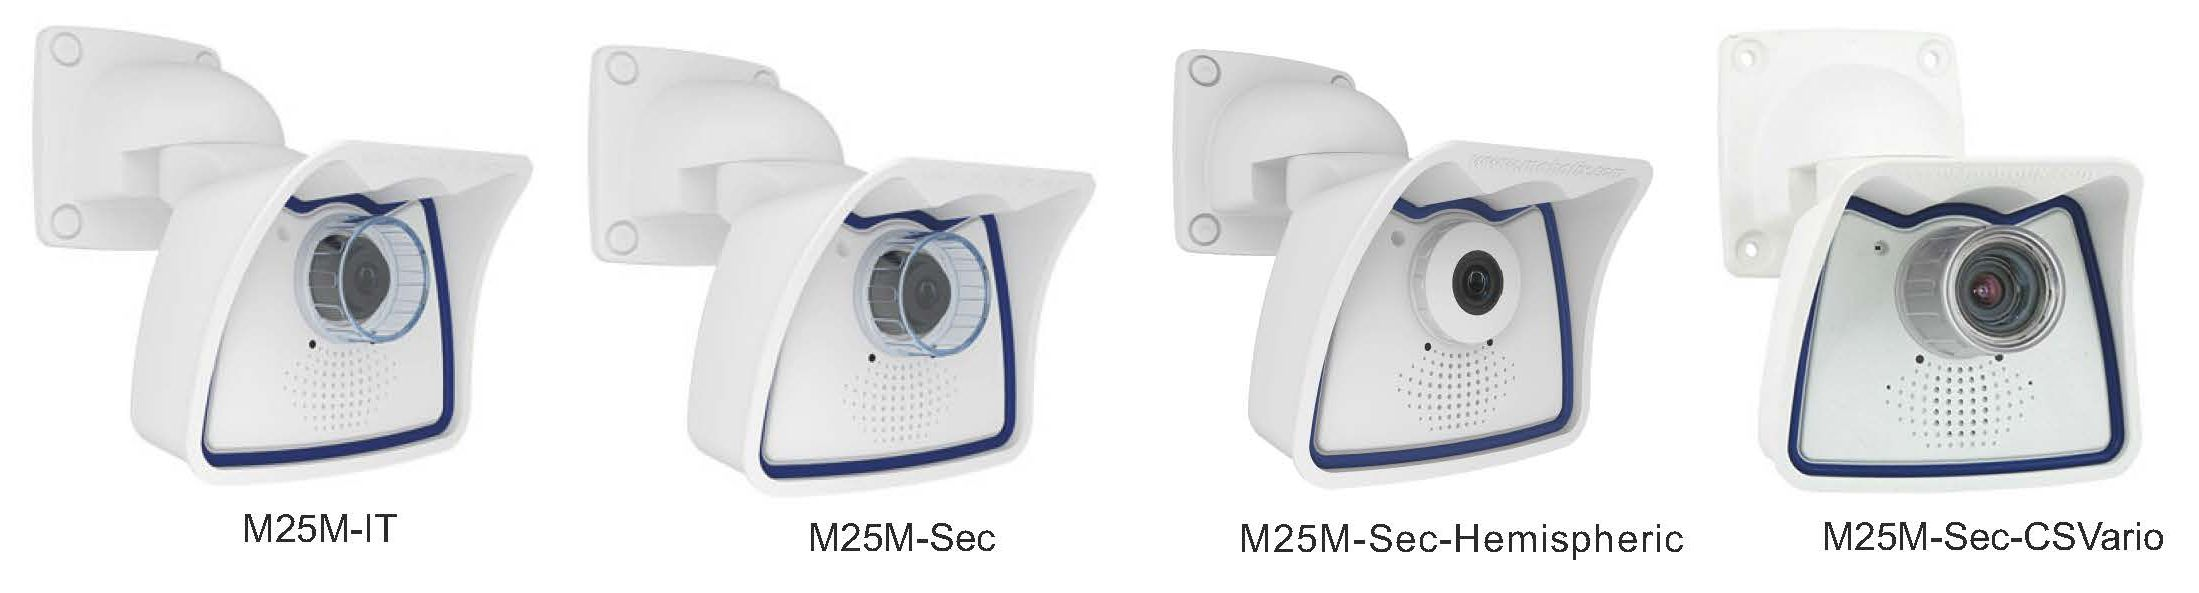 IP камера Mobotix AllroundMono M25